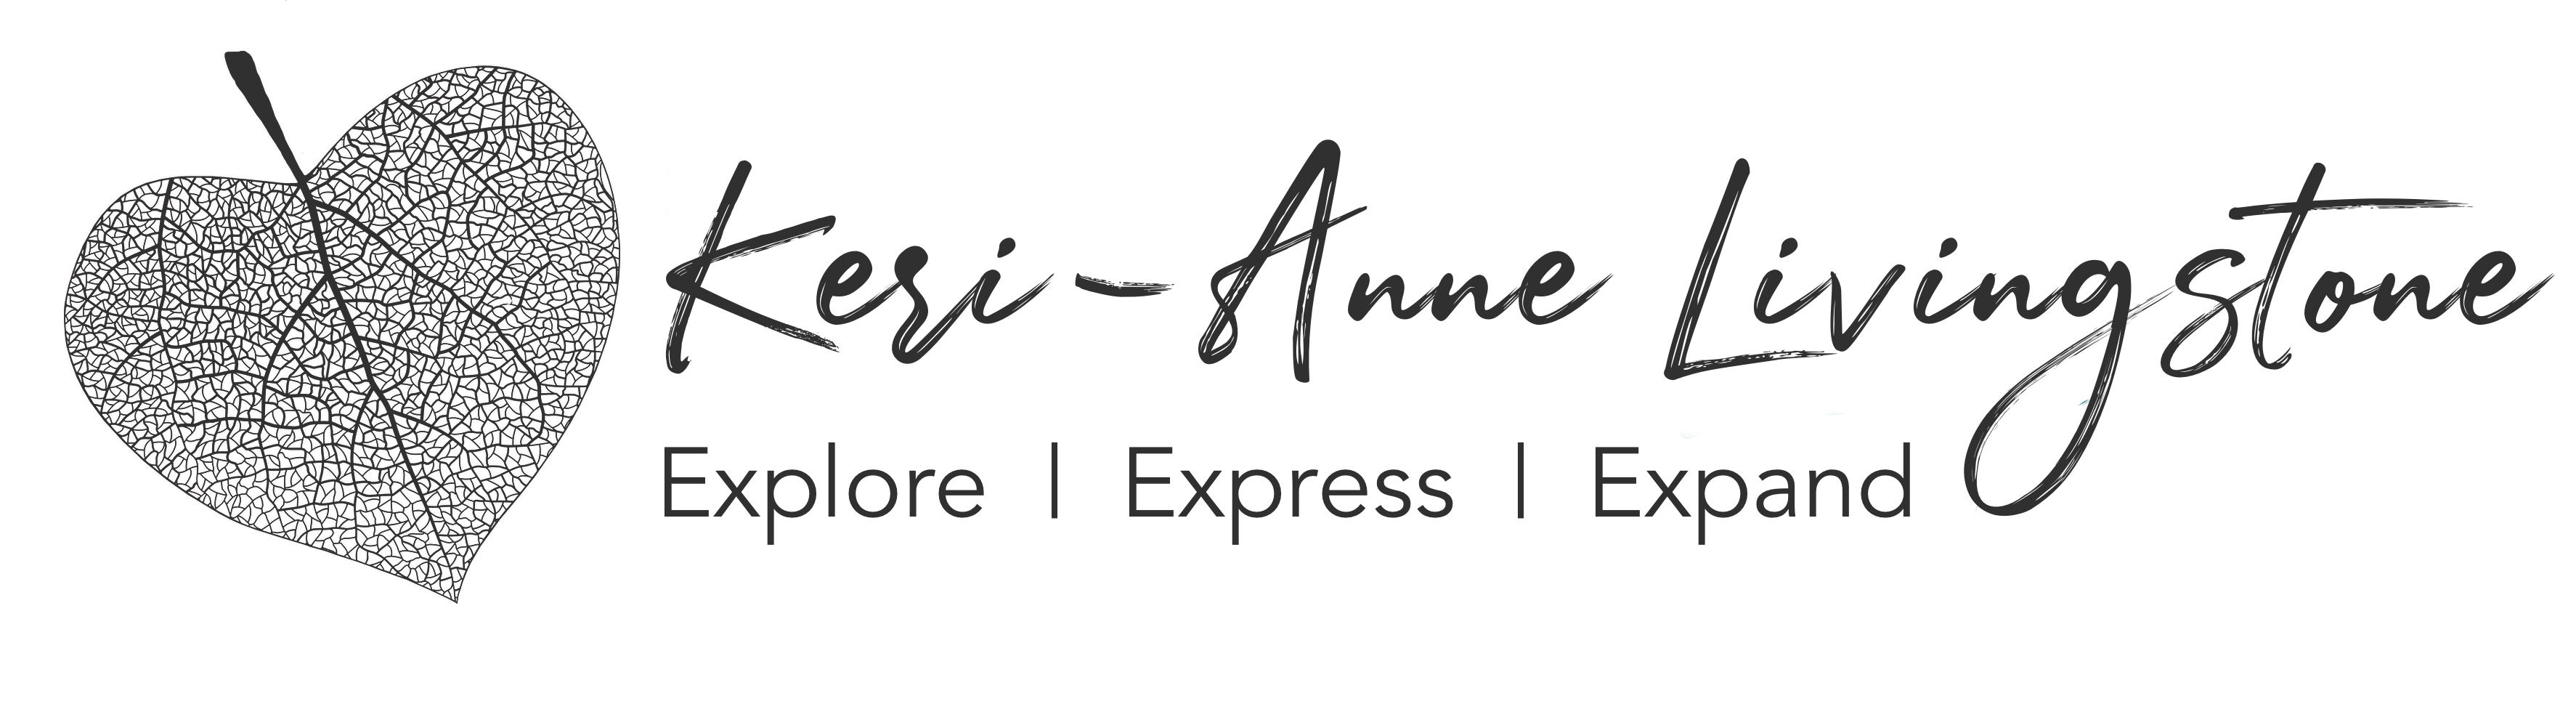 Keri-Anne Livingstone